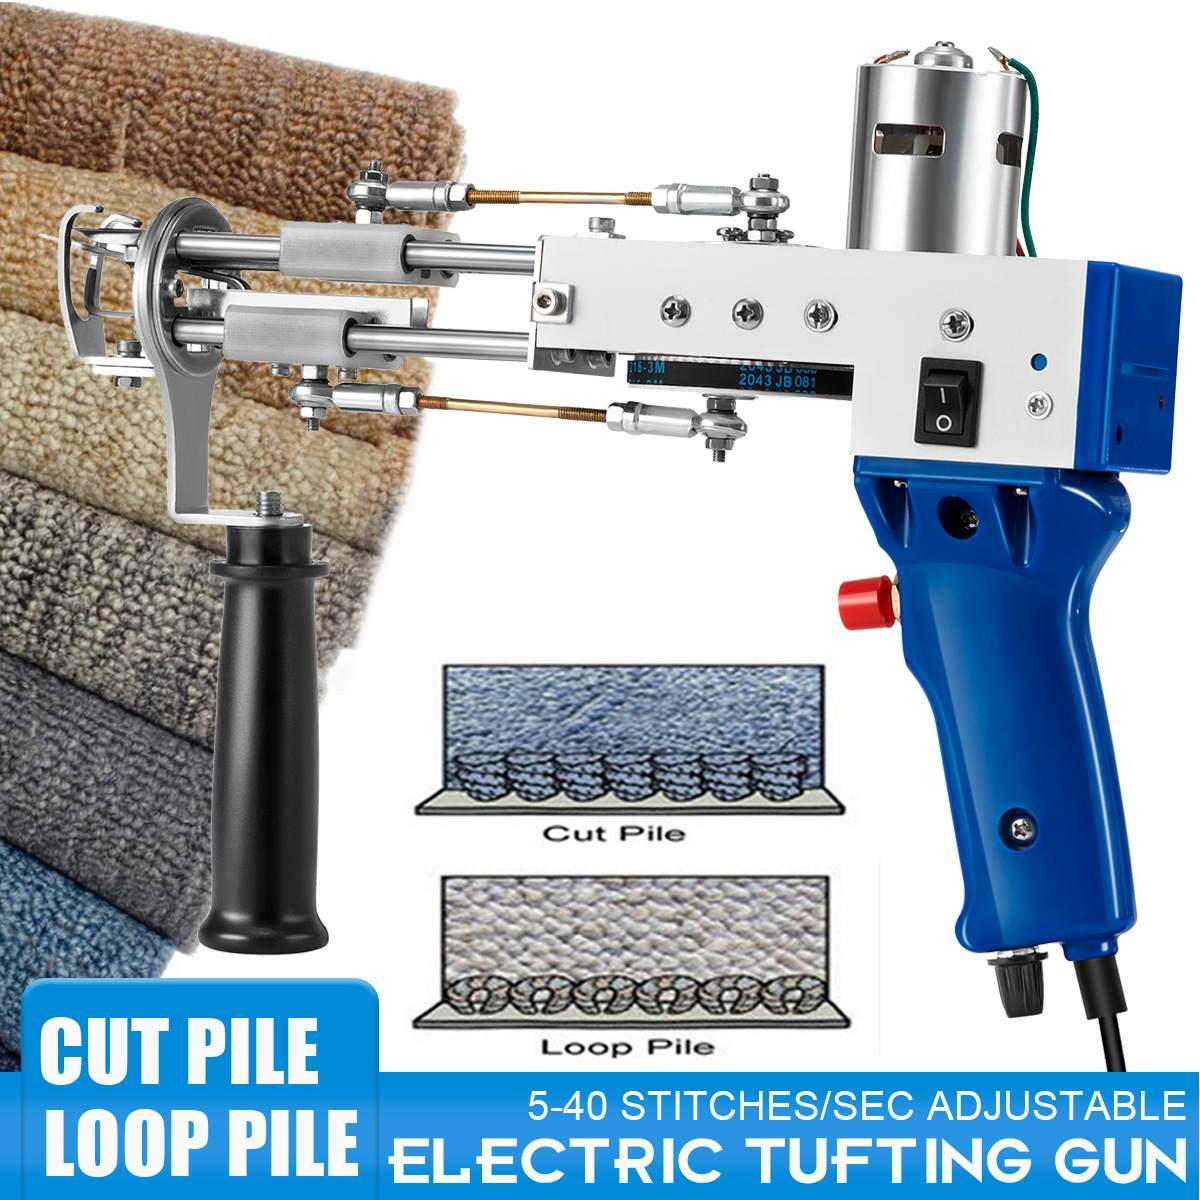 Electric Carpet Tufting Gun, Rug Weaving Flocking Machine, Industrial Embroidery, DIY Handmade Knitting Machine (Cut/loop Pile)